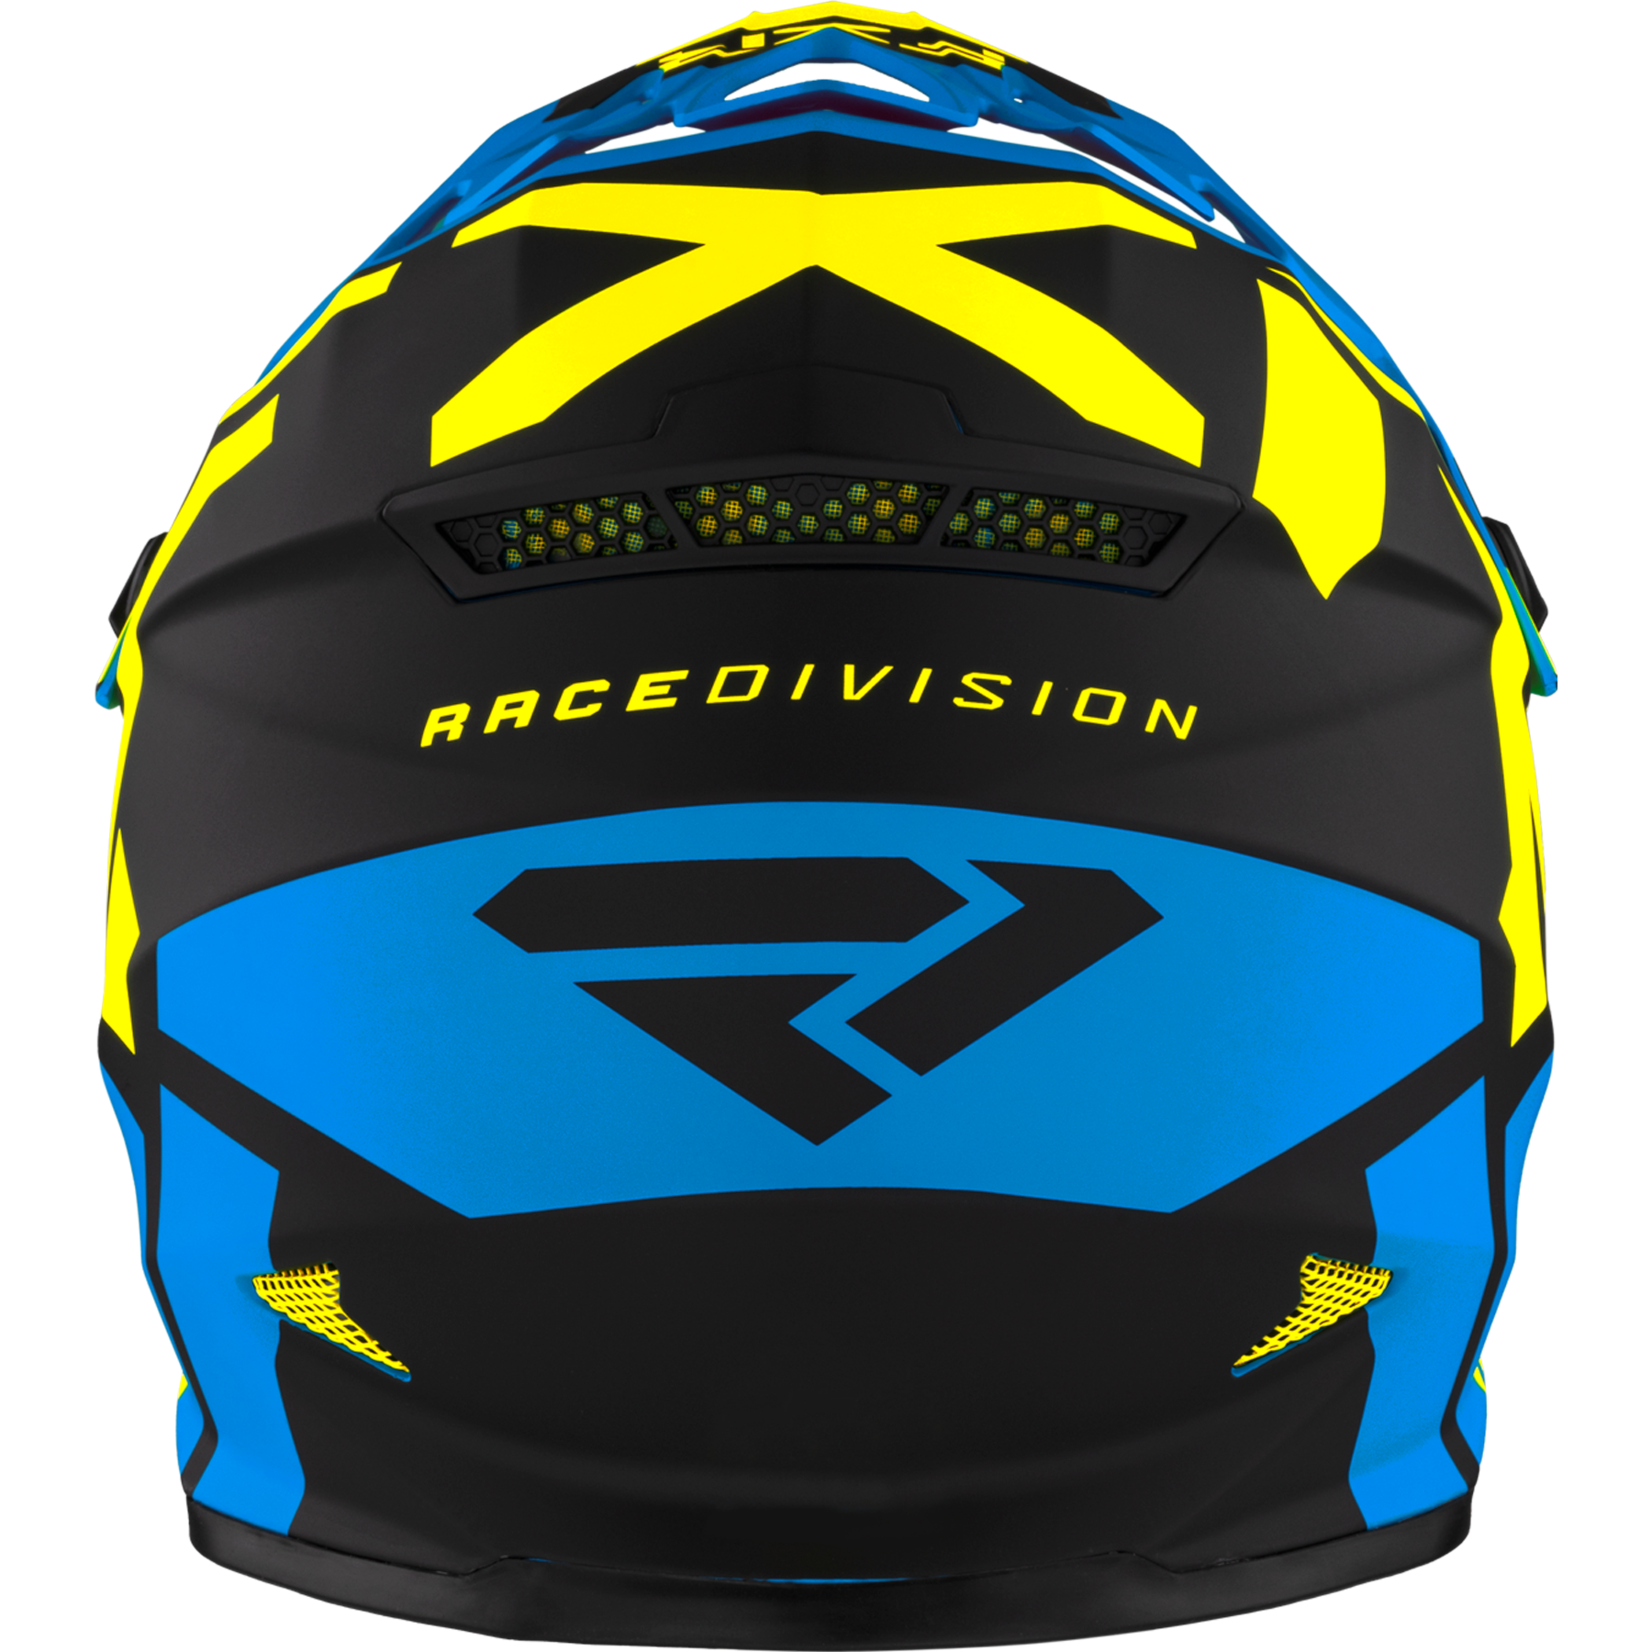 FXR Youth Legion Helmet - Blue/HiVis - L